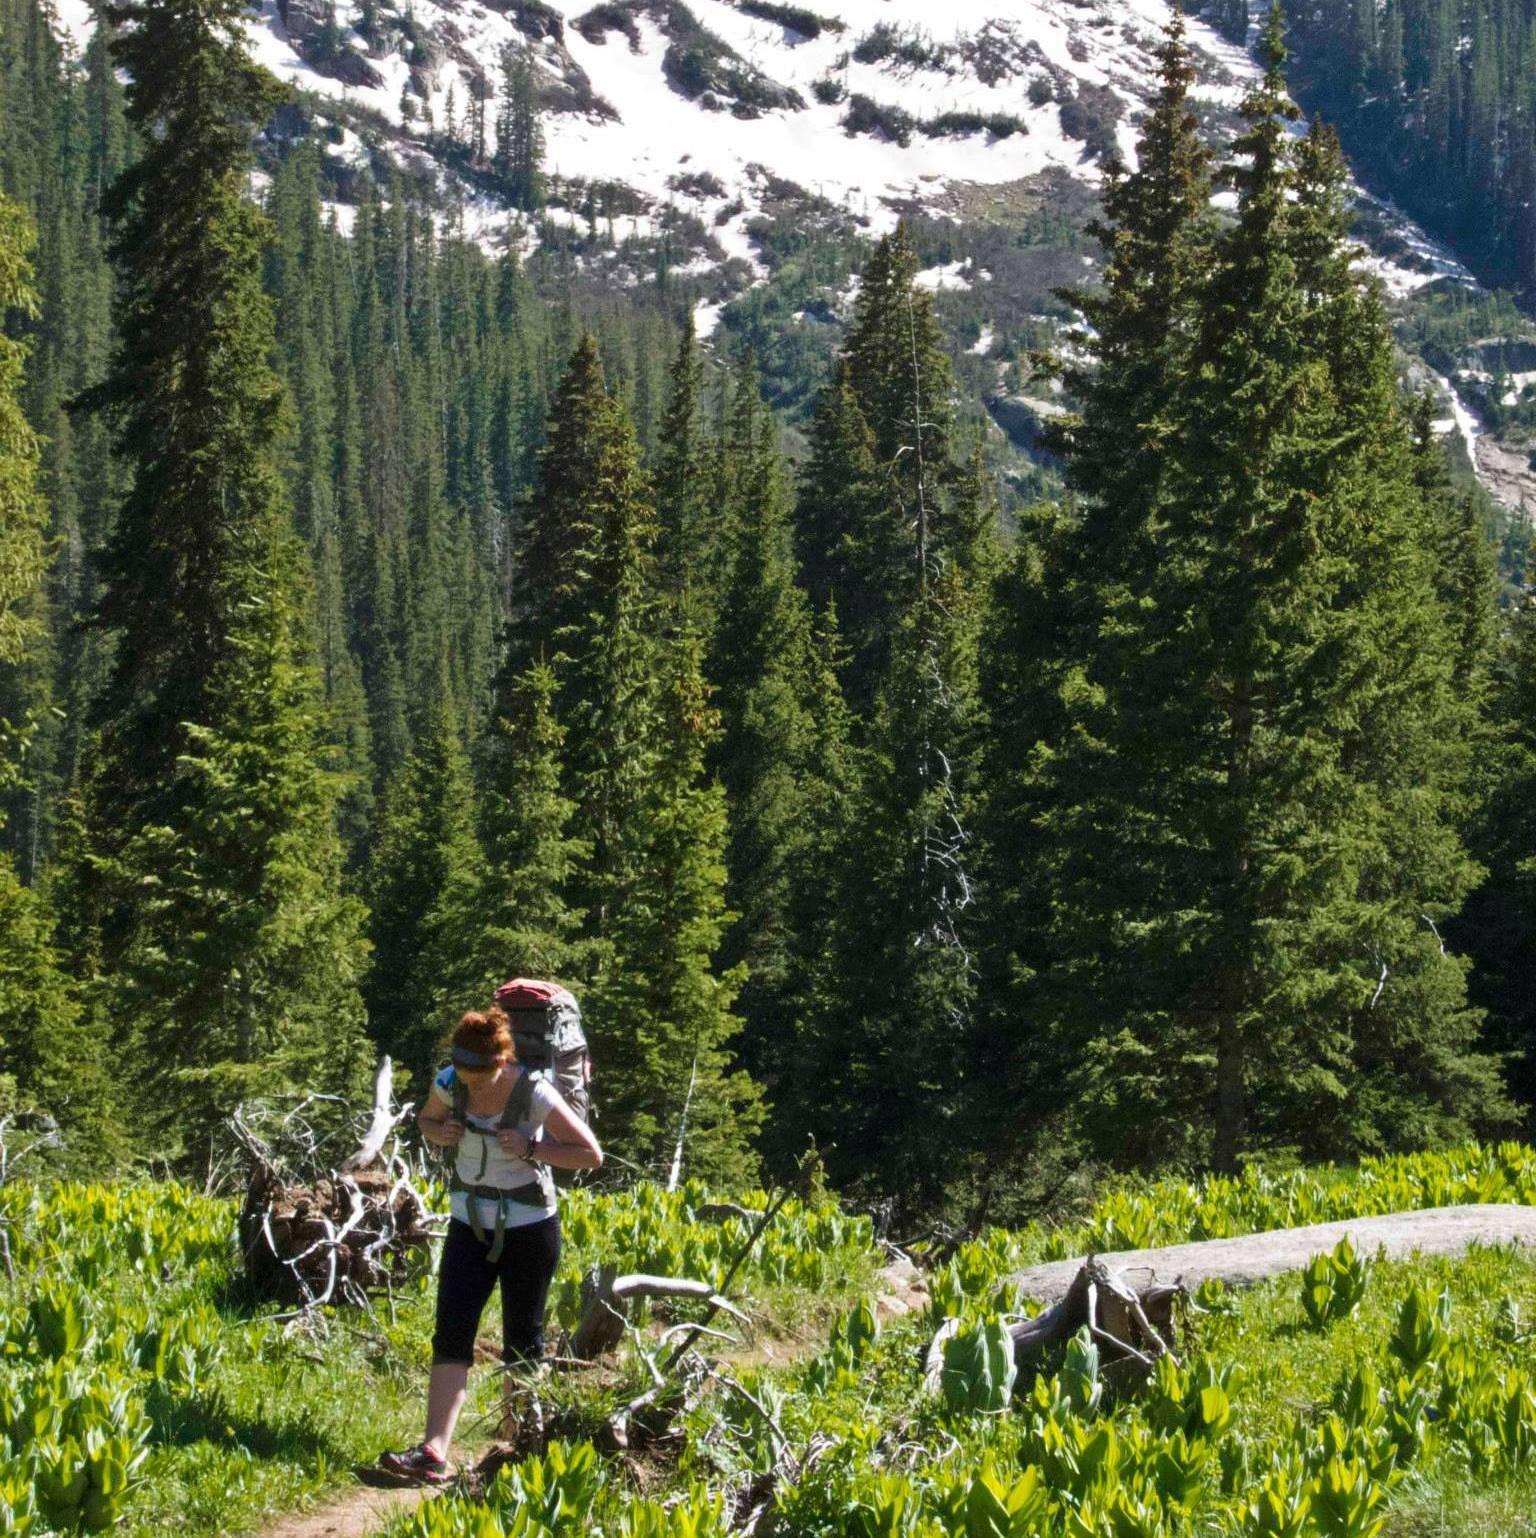 Samantha Krezinski backpacking in Durango, CO. Photo by Dan Rothman.